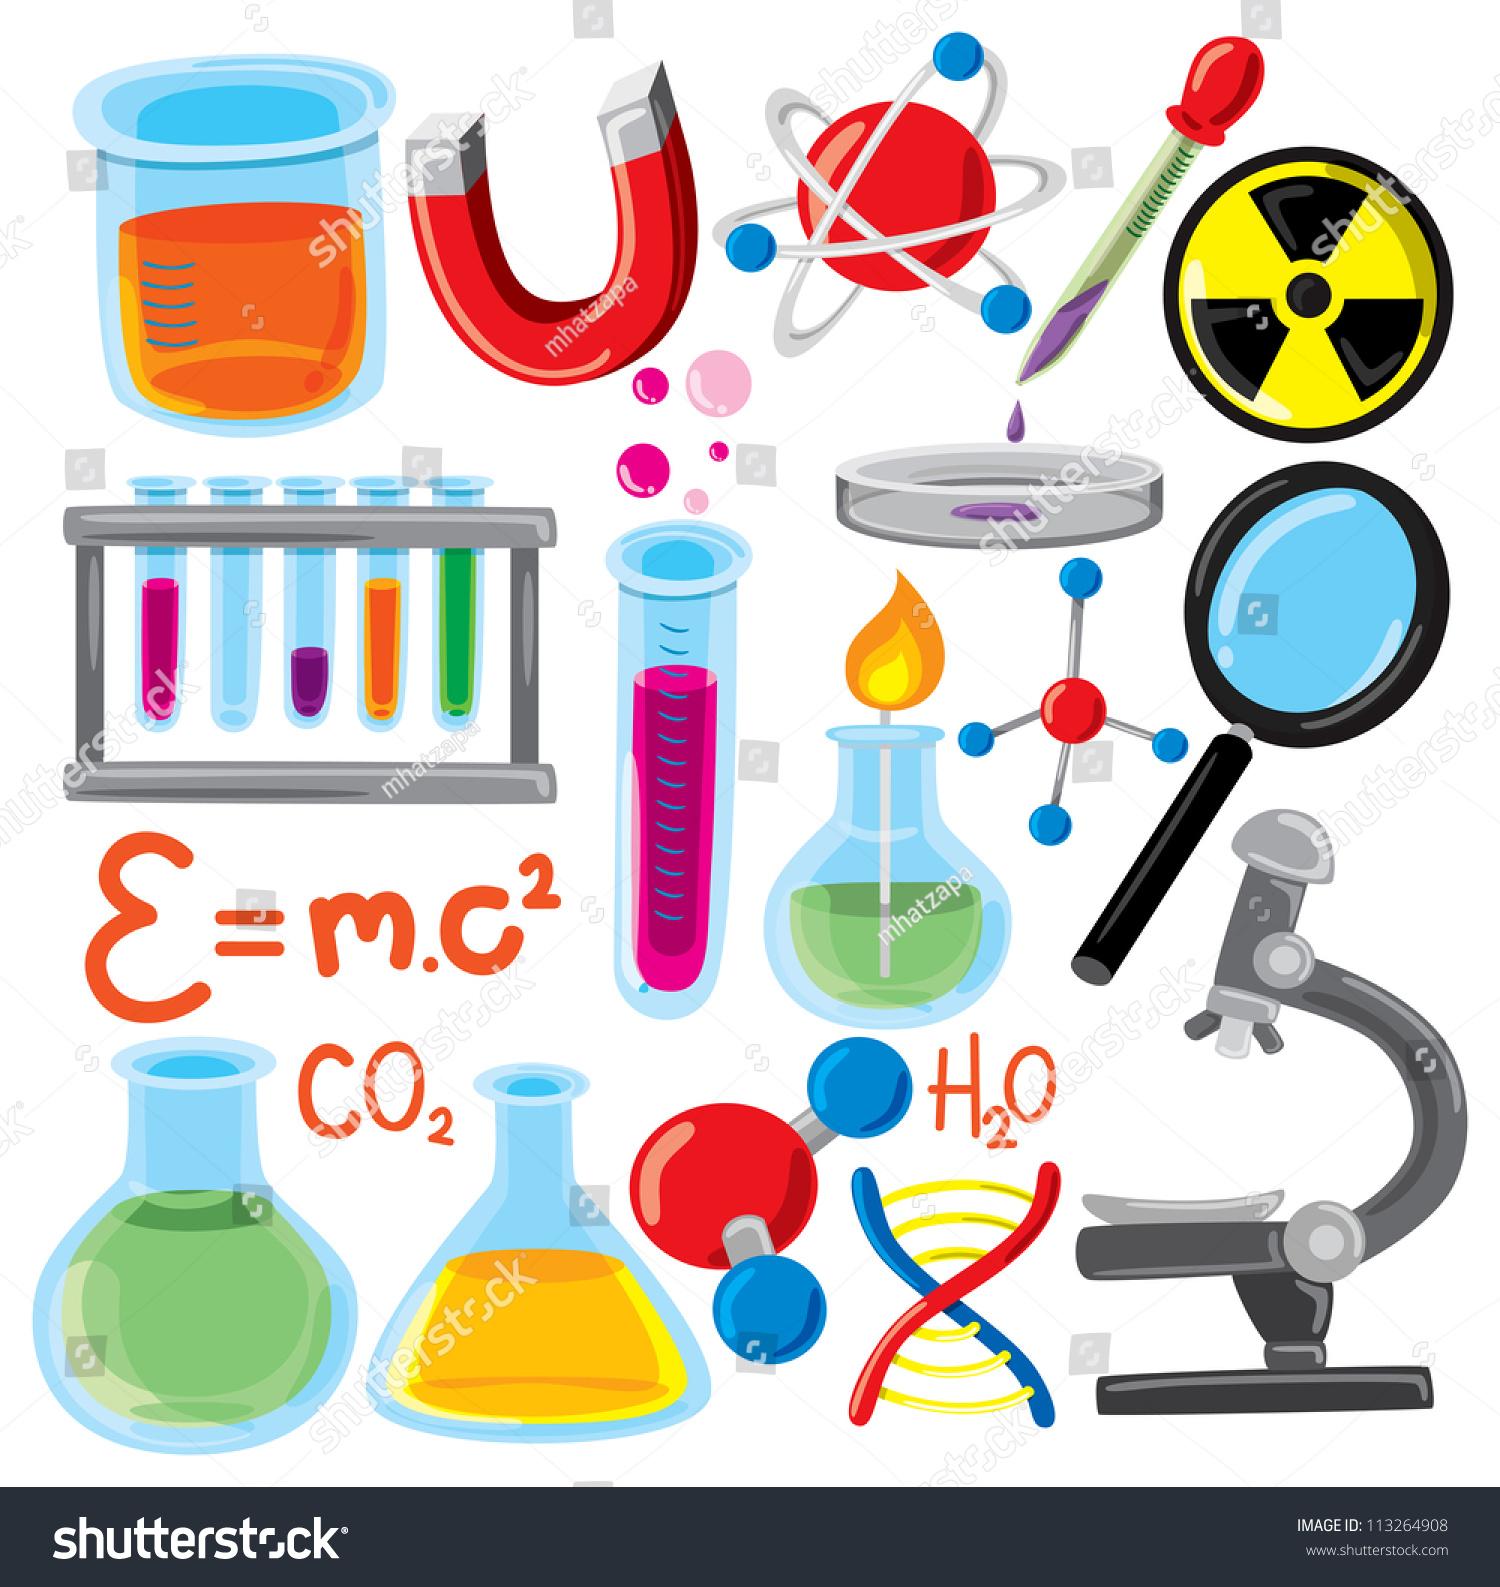 science stuff icon vector shutterstock pic